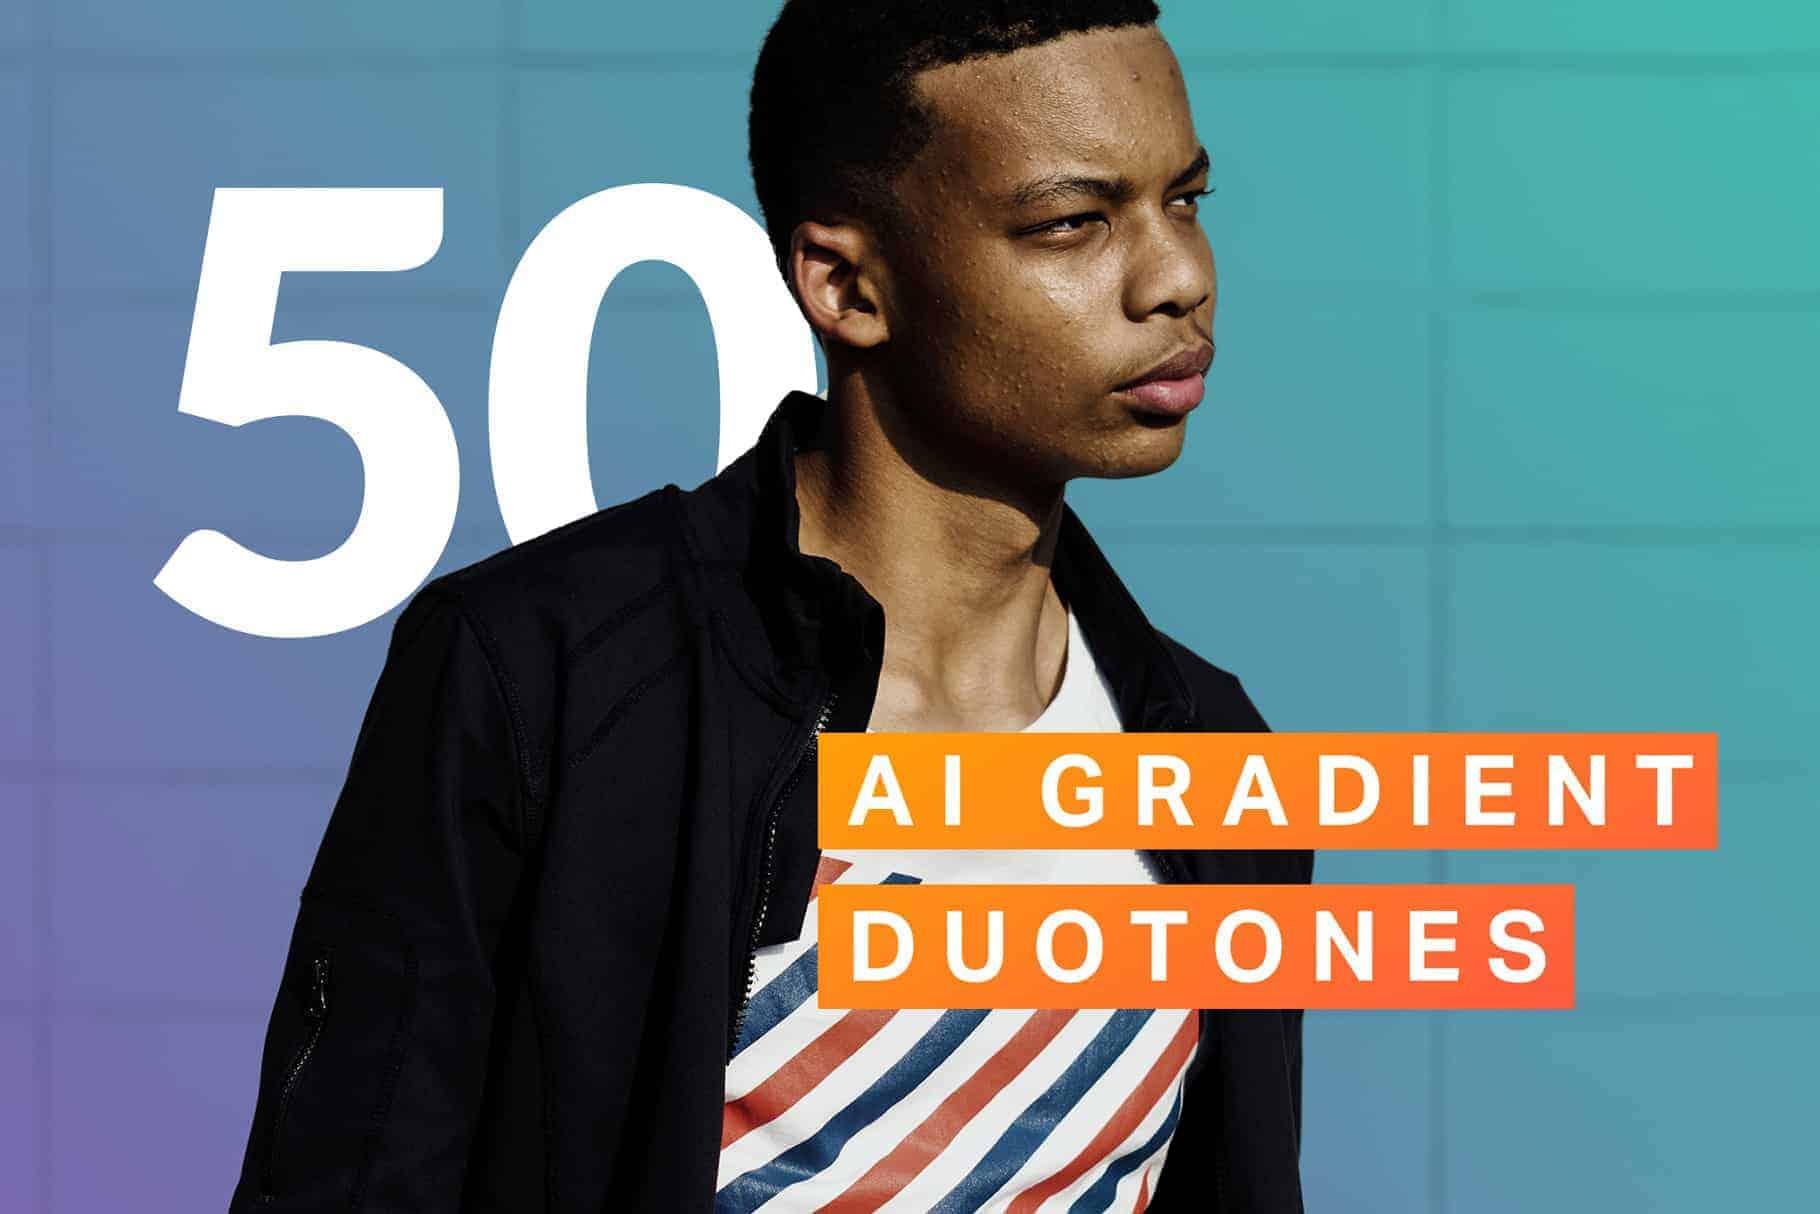 8 Free Gradient Duotone Photoshop Actions